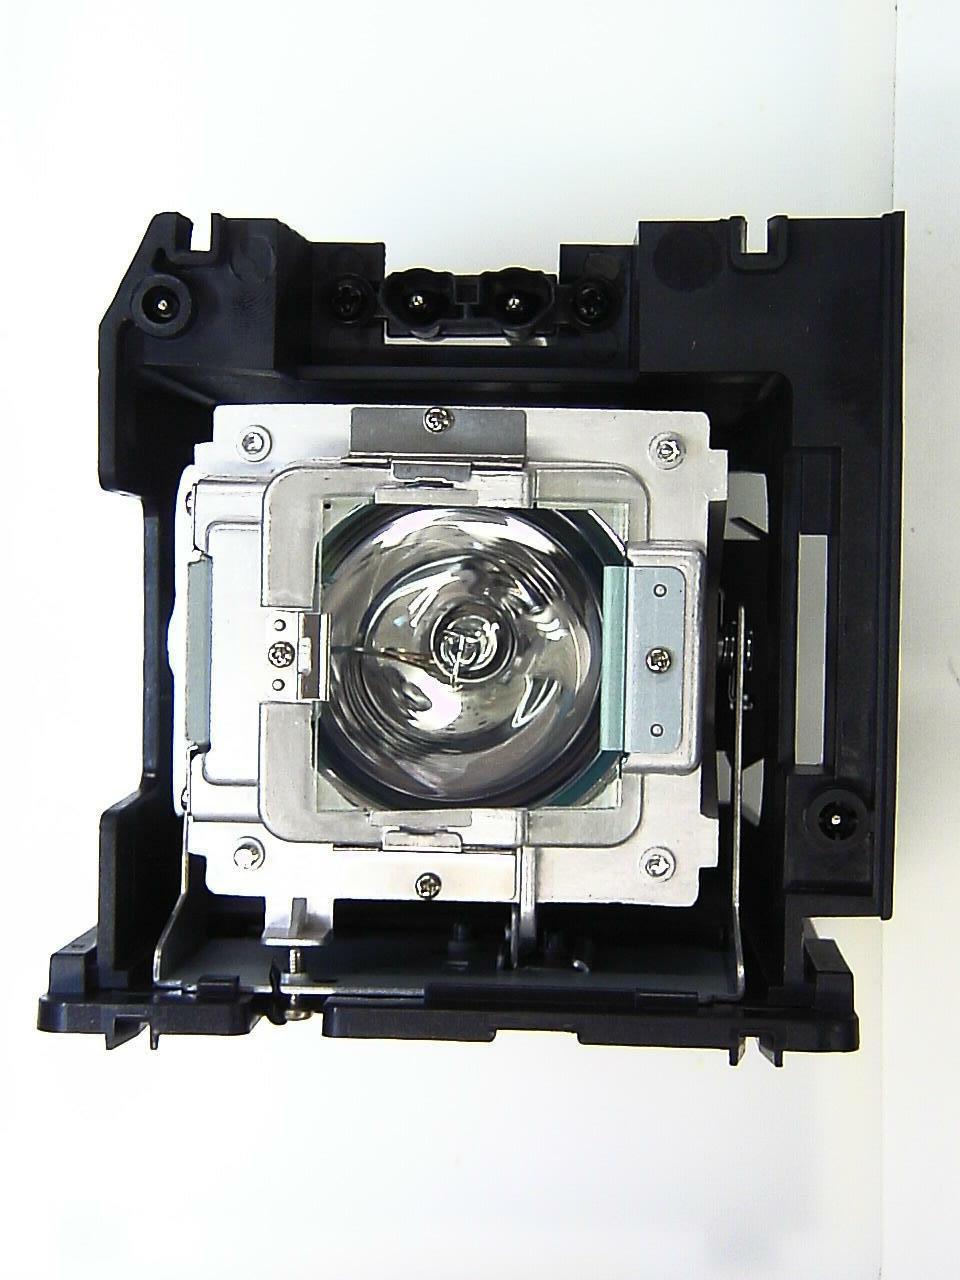 Lampking Cus Projector In226 Infocus In5318 Lamp